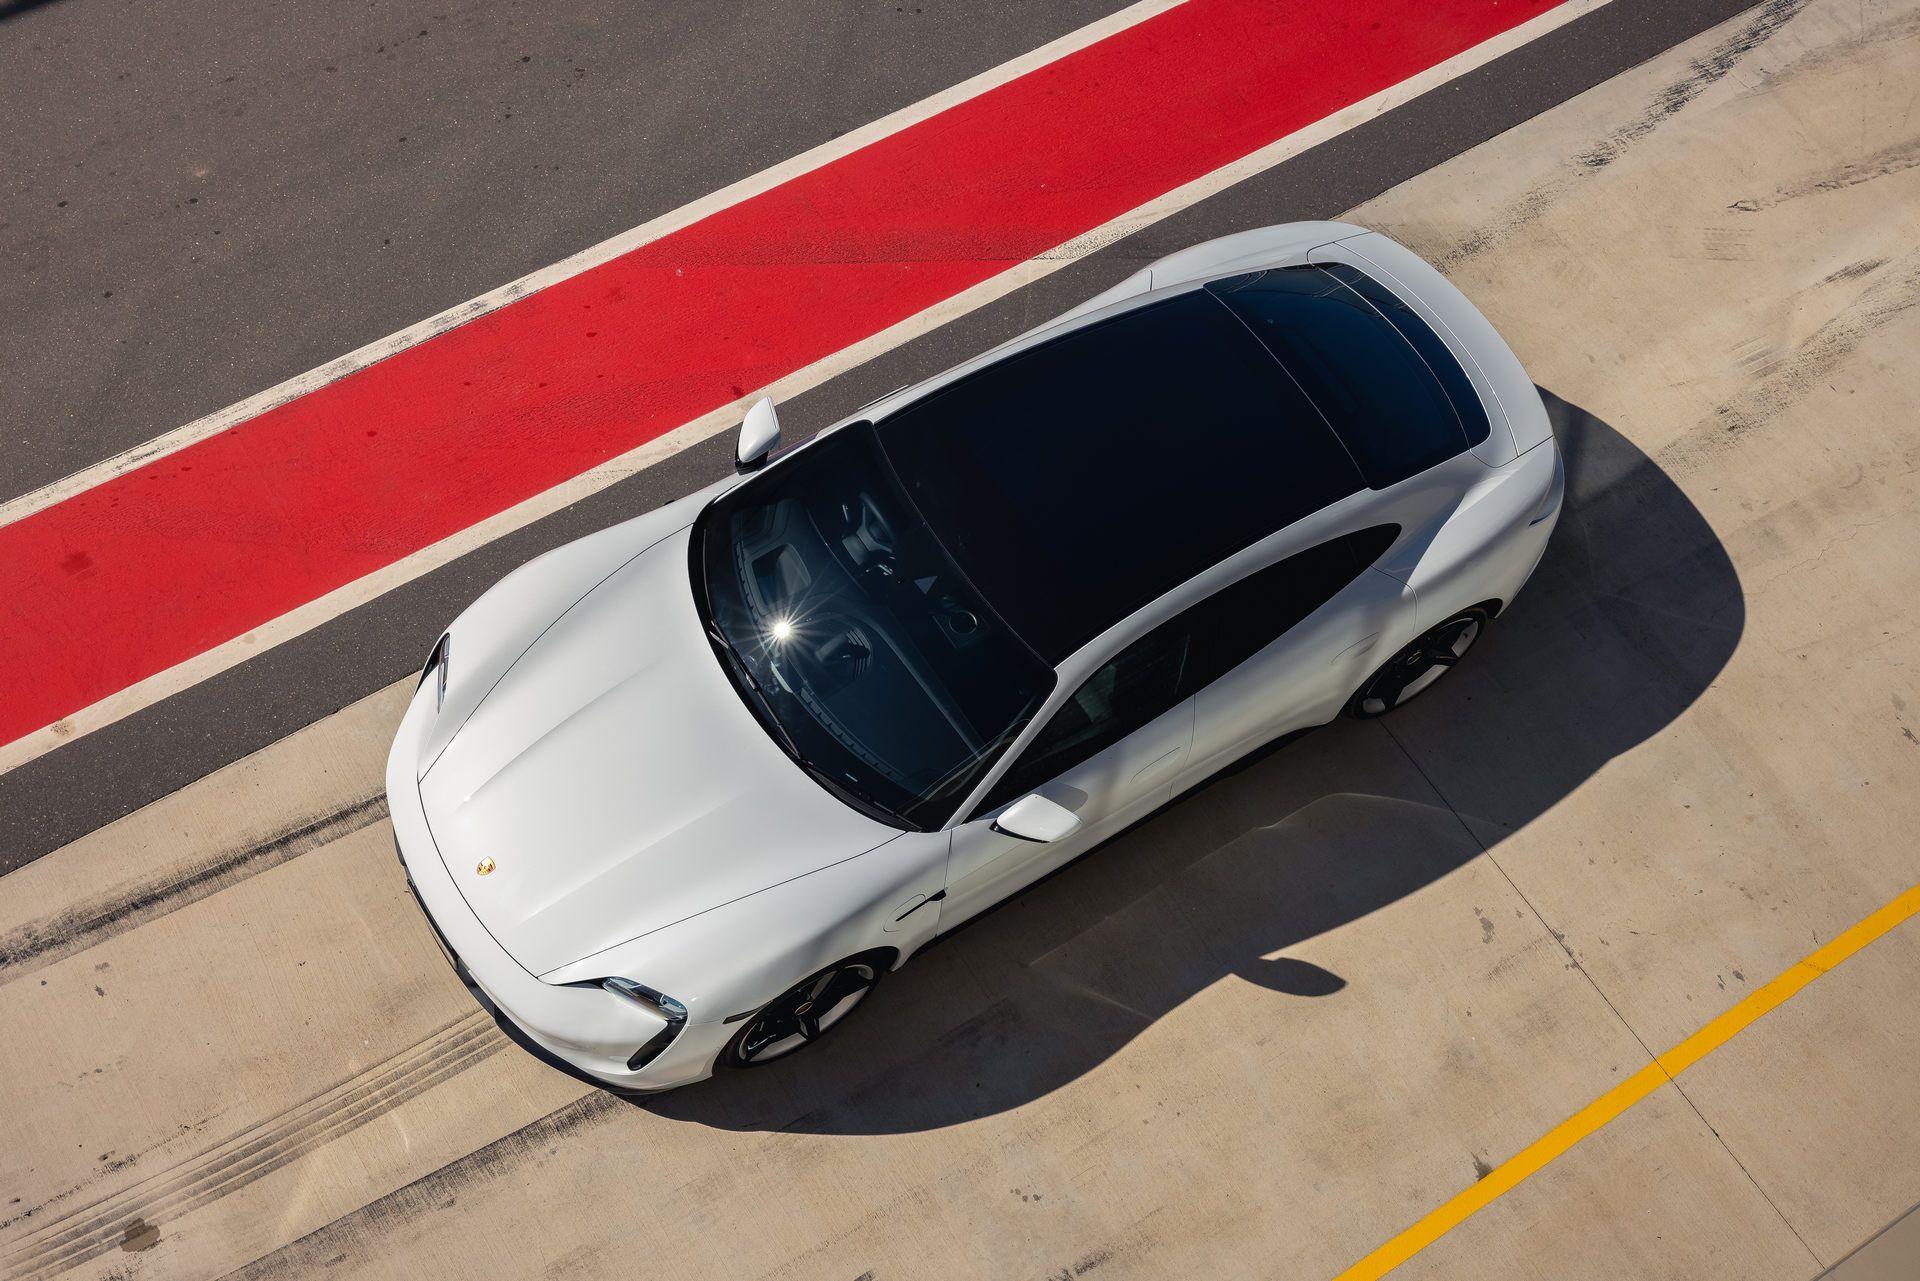 Porsche-Taycan-Turbo-S-The-Bend-Motorsport-Park-39